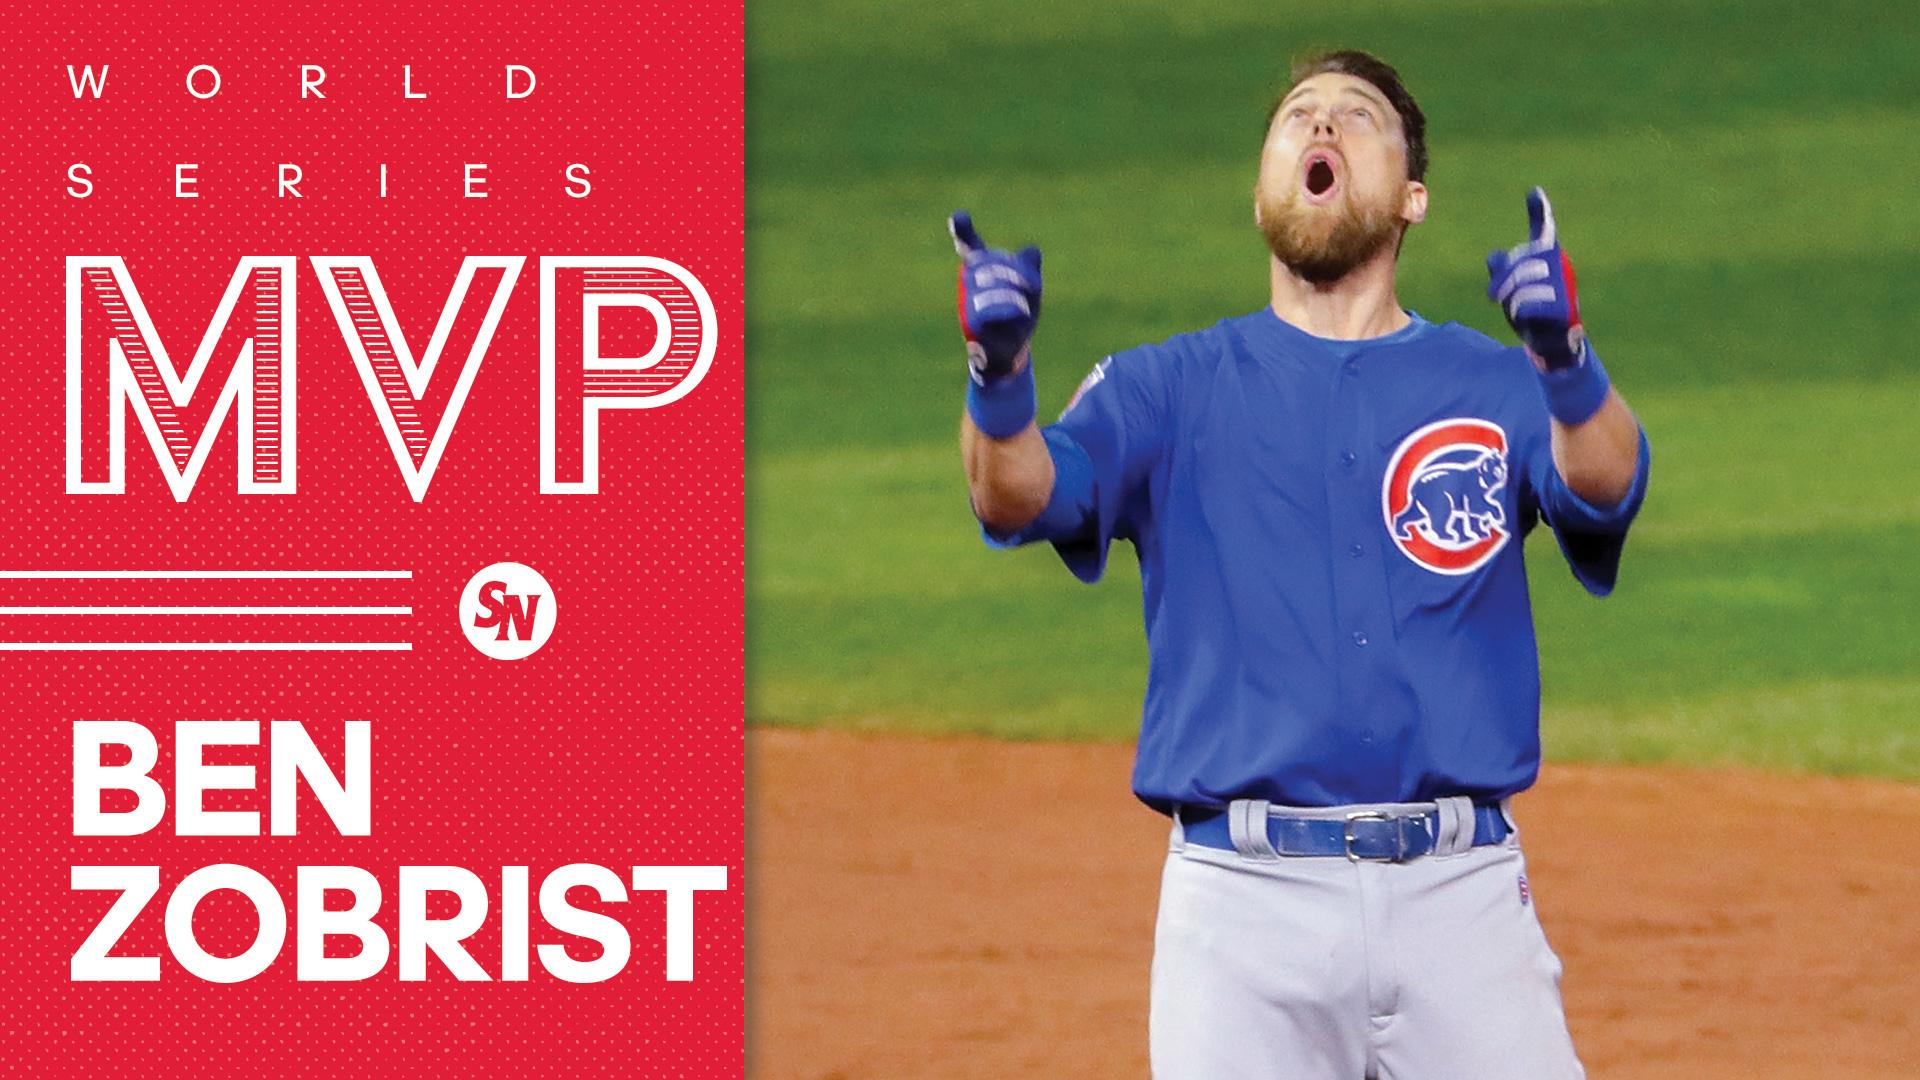 463590cbf Ben Zobrist named MVP of 2016 World Series